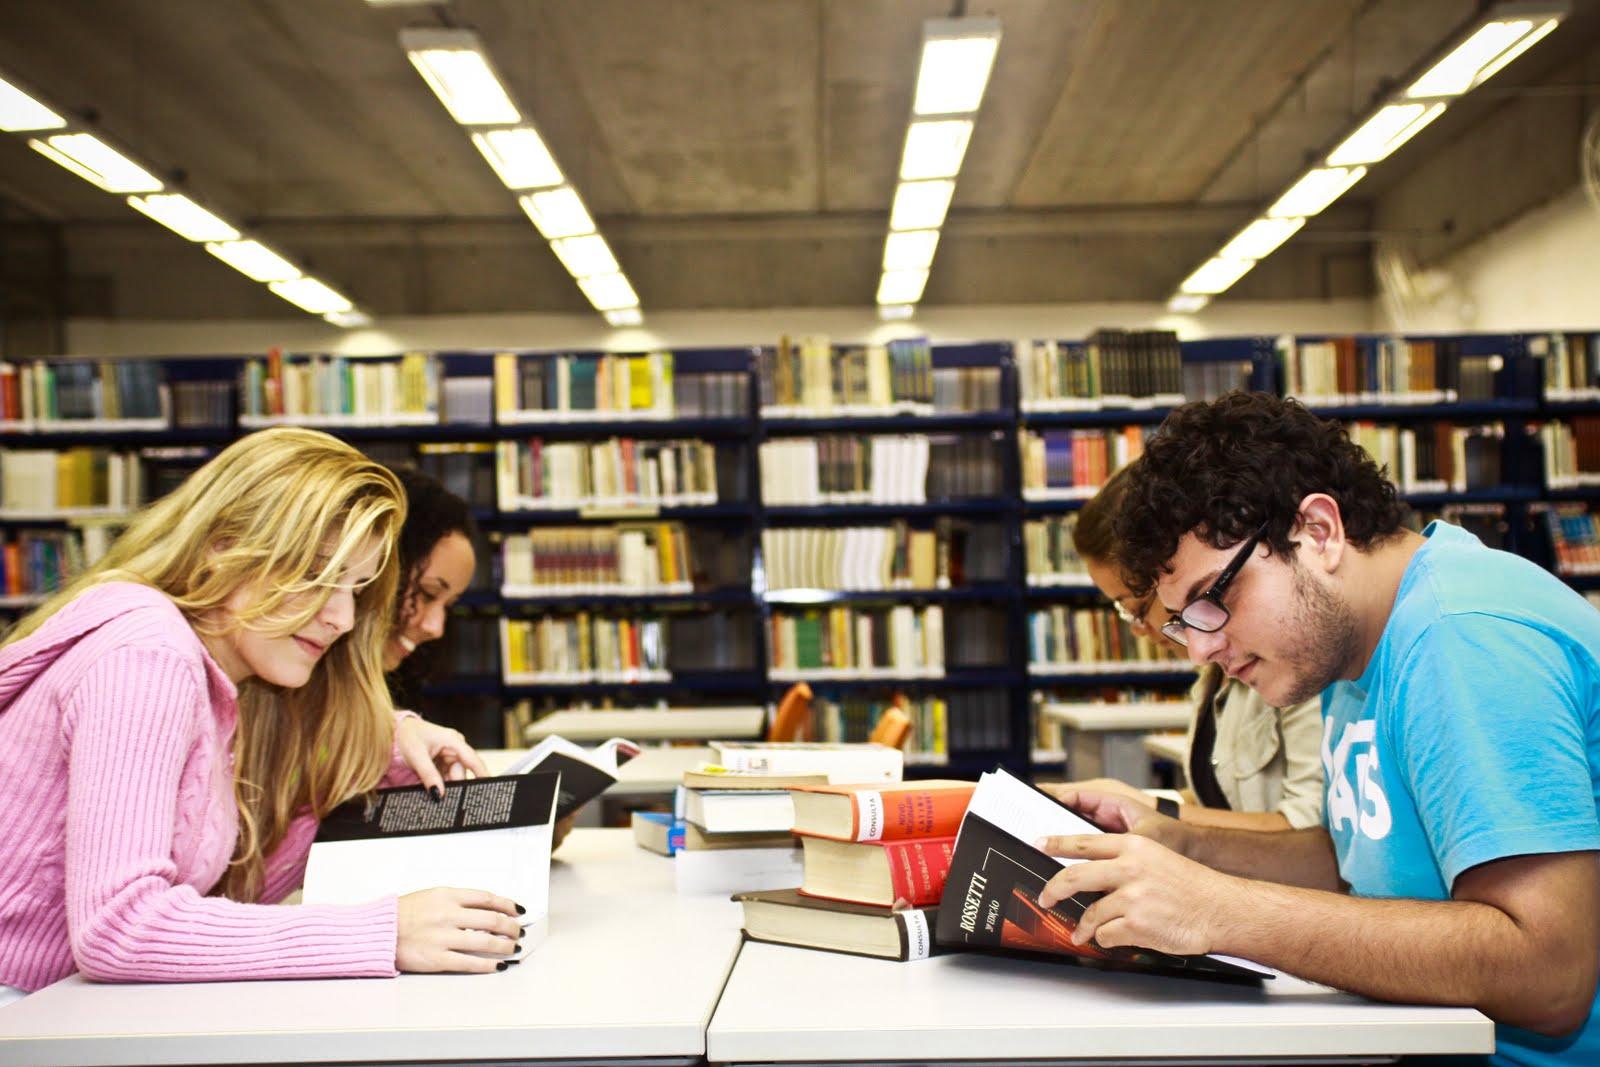 piores faculdades do Brasil